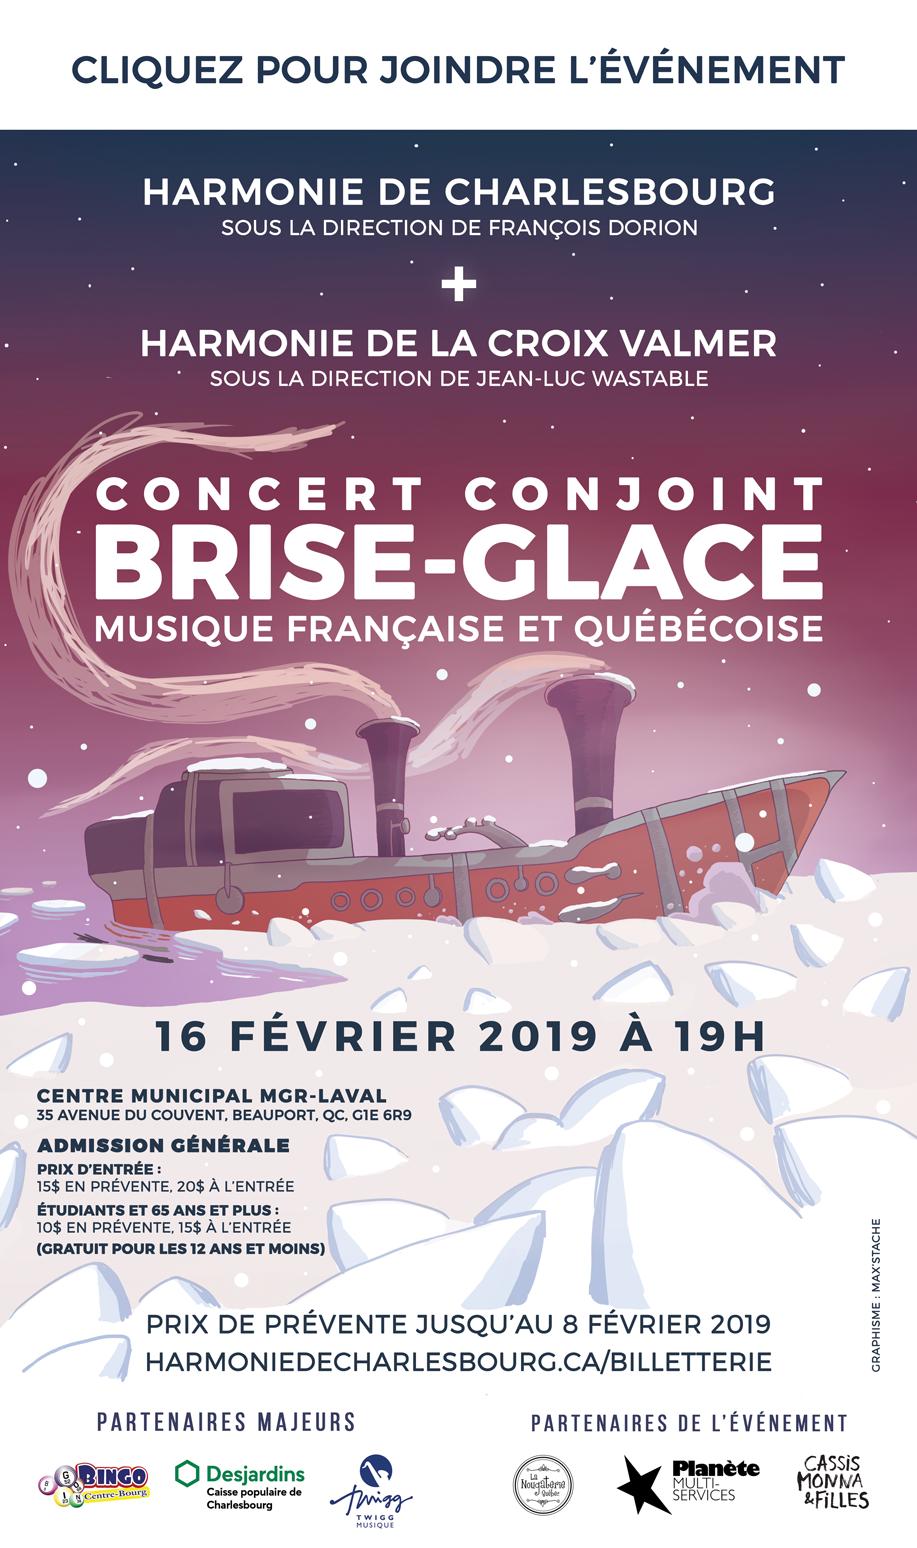 harmonie-de-charlesbourg-concert-conjoint-brise-glace-fev-2019-web